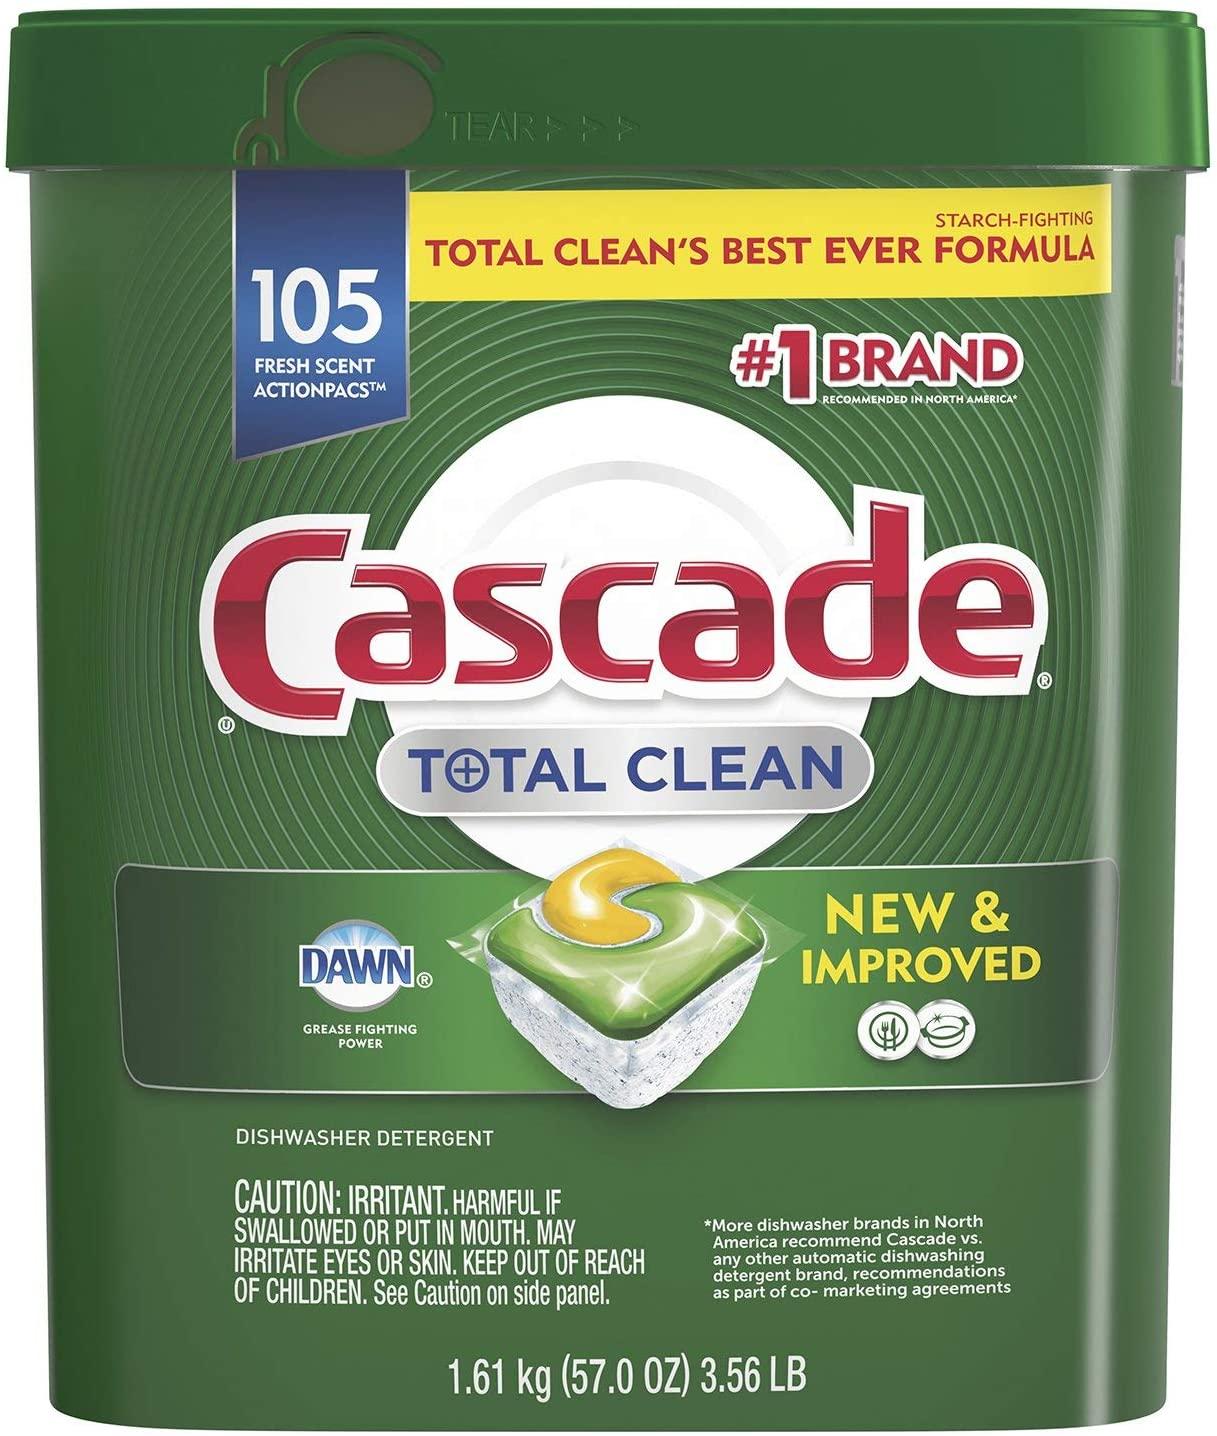 Cascade Total Clean ActionPacs, Dishwasher Detergent, Fresh Scent - 105 Count